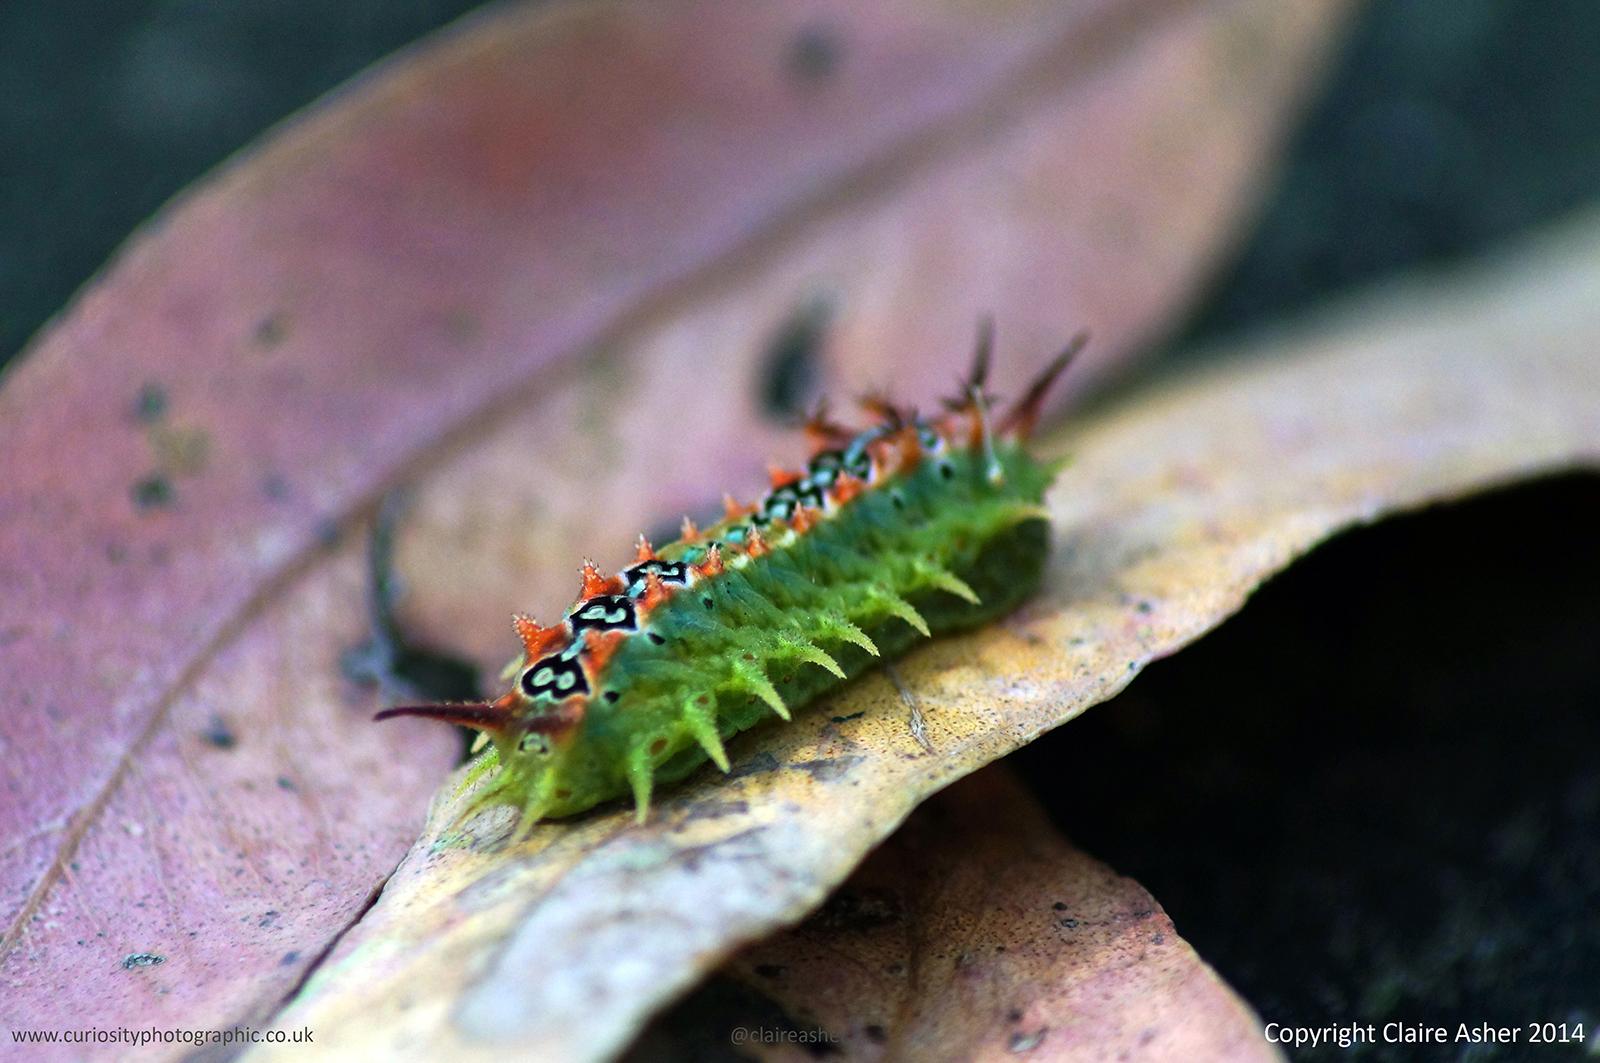 A caterpillar photographed in Philip Island, Australia in 2014